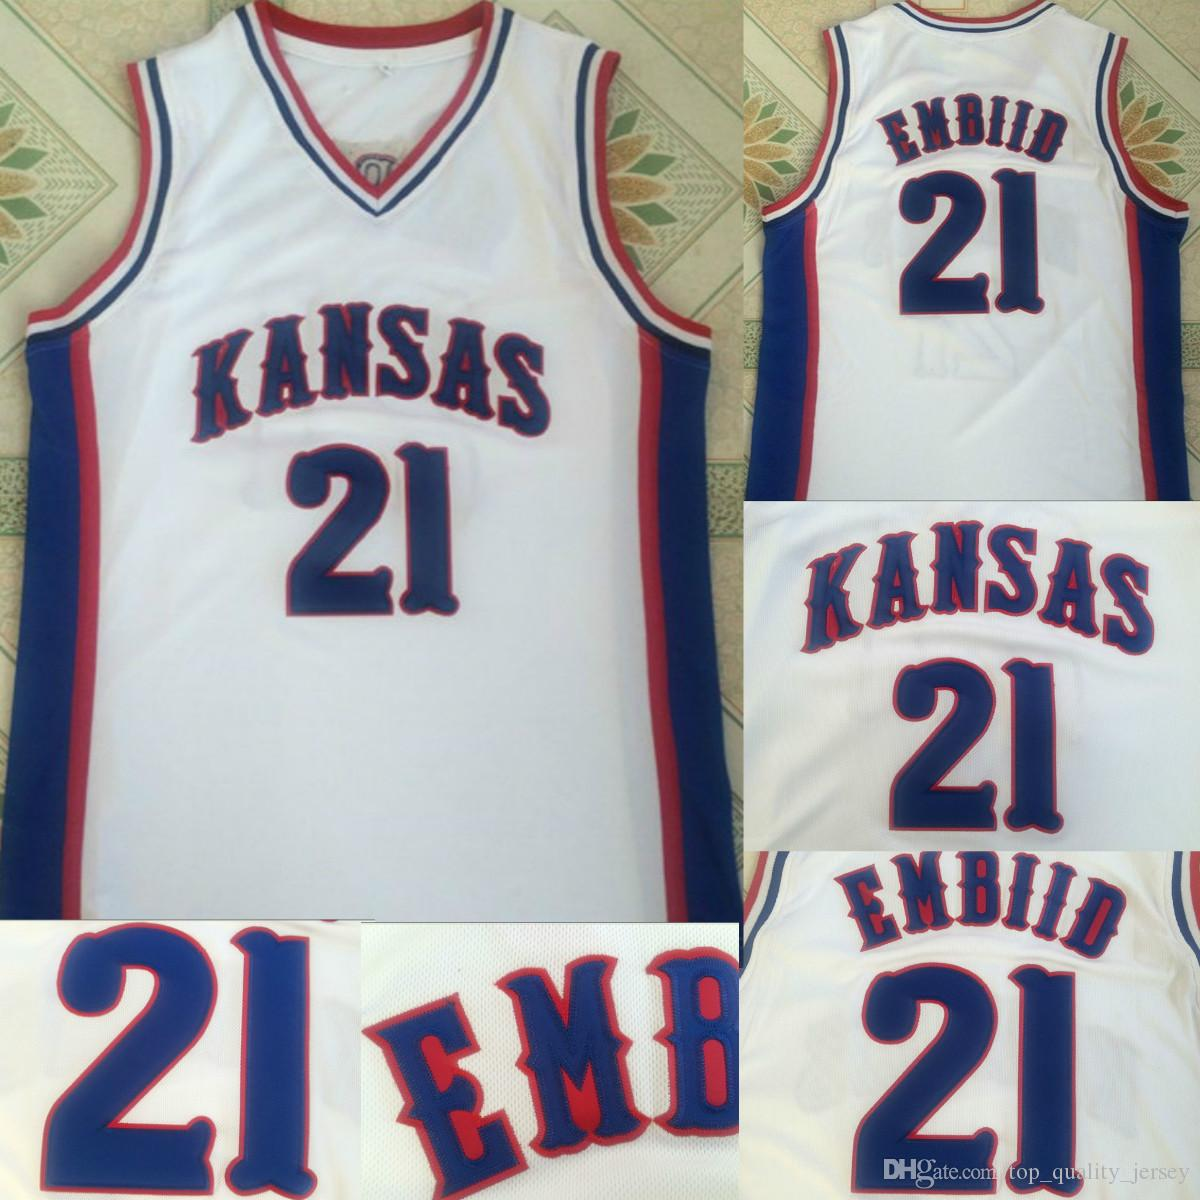 a9f1a8b59 adidas philadelphia 76ers authentic royal blue joel embiid alternate jersey  mens  cheap mens kansas jayhawks 21 joel embiid college basketball jerseys  white ...